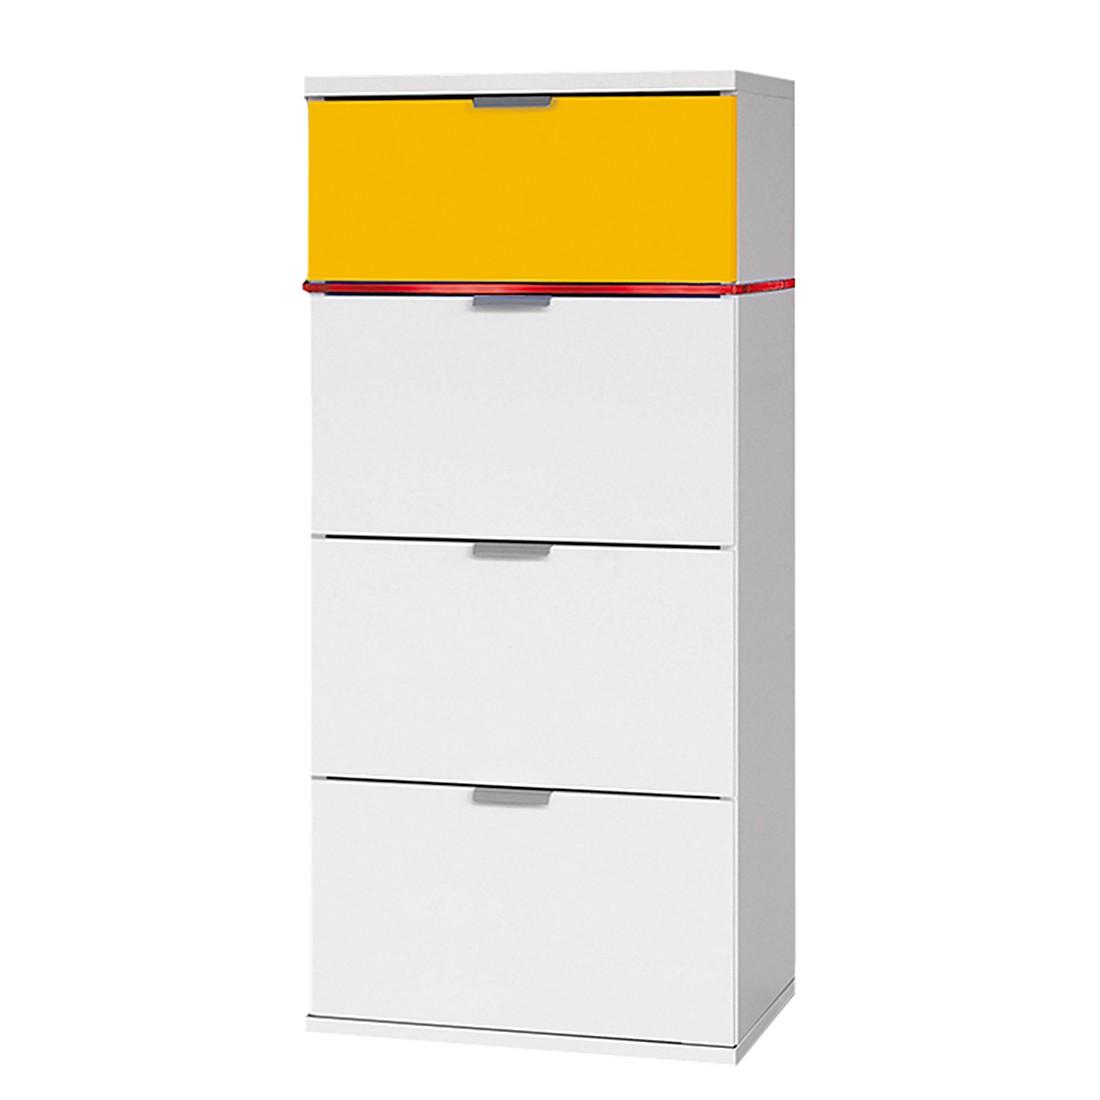 Kommode ColourSleep II - Polarweiß/Gelb (Mit Beleuchtung)